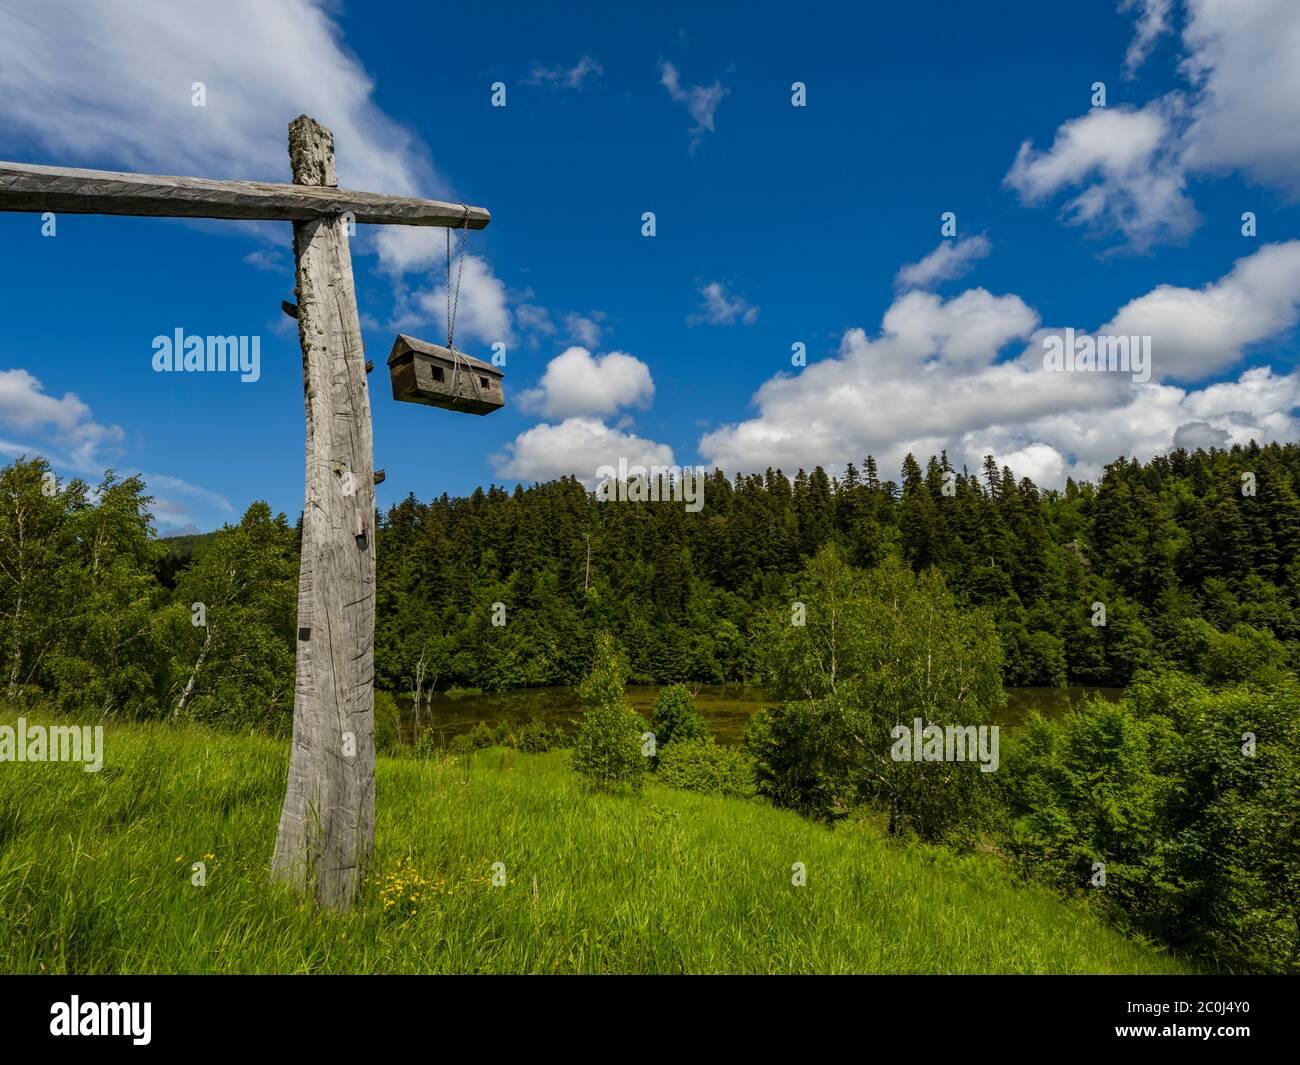 Interesting artistic work hanging small model house atop hill near lake Mrzla vodica Croatia Europe Stock Photo